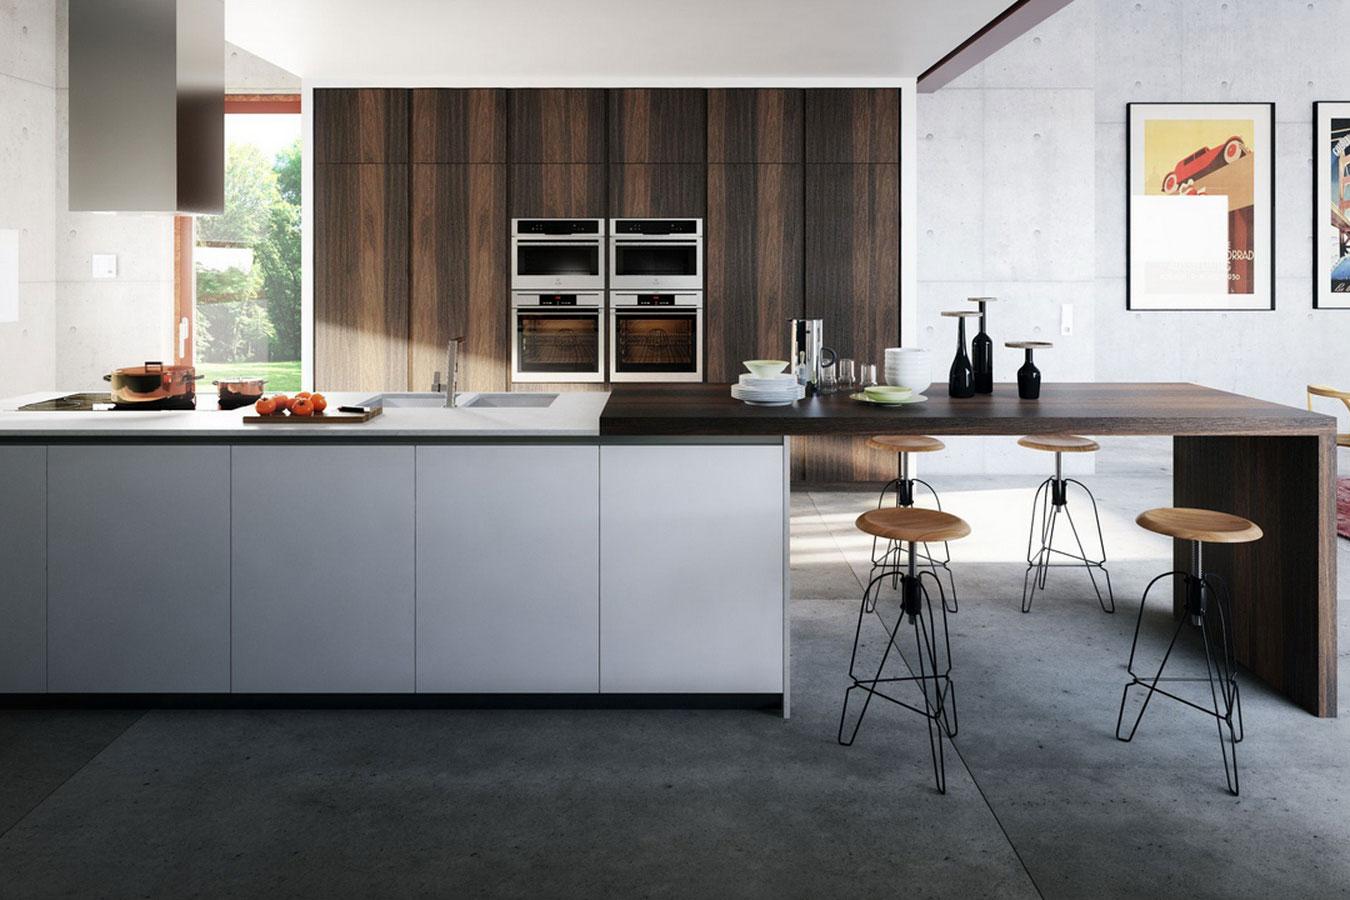 Cucina velvet di gd arredamenti righetti mobili novara for Mobili novara